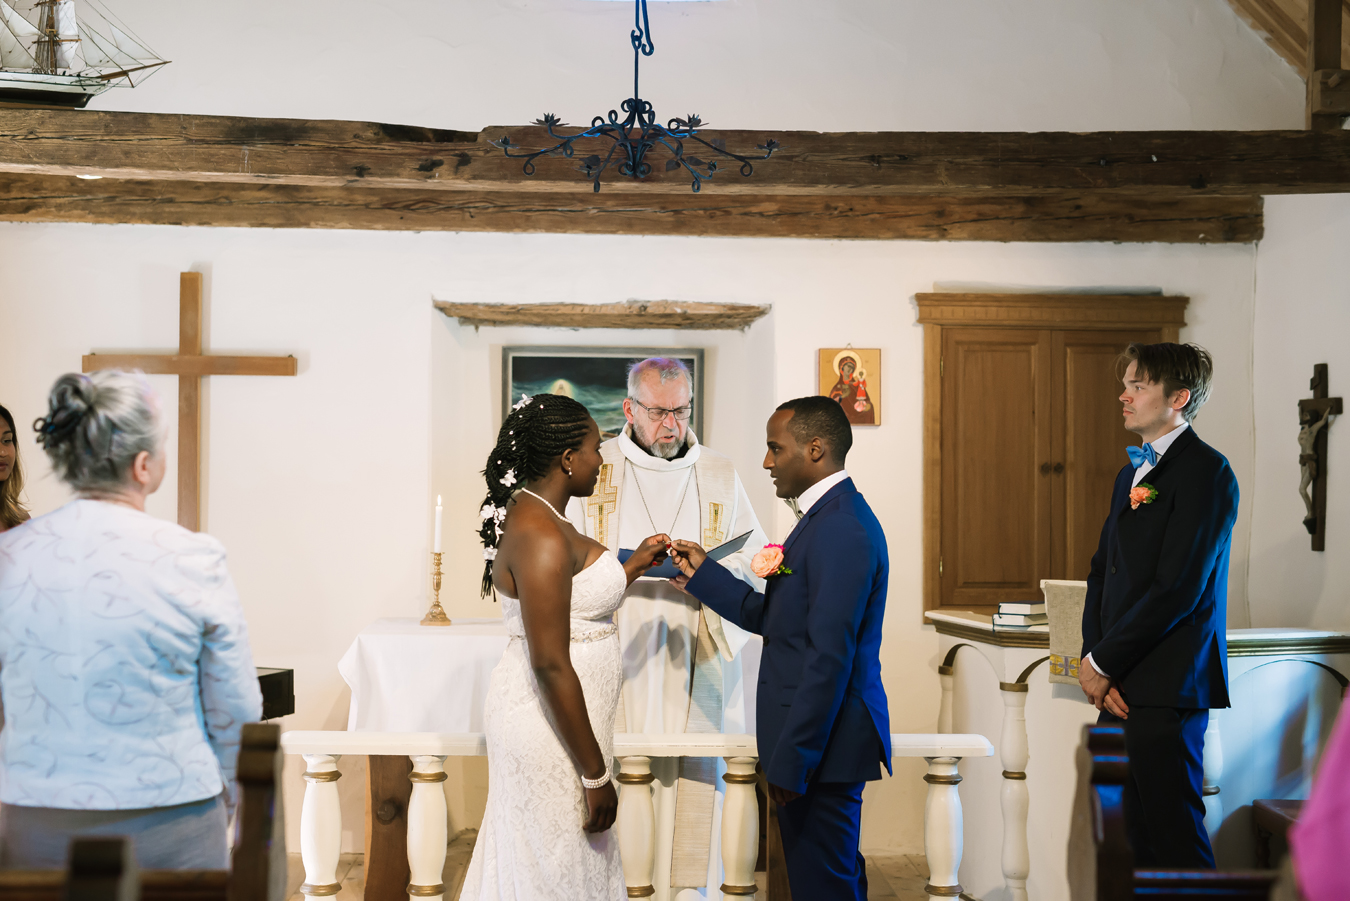 026-bröllop-gotland-fridhem-neas-fotografi.jpg